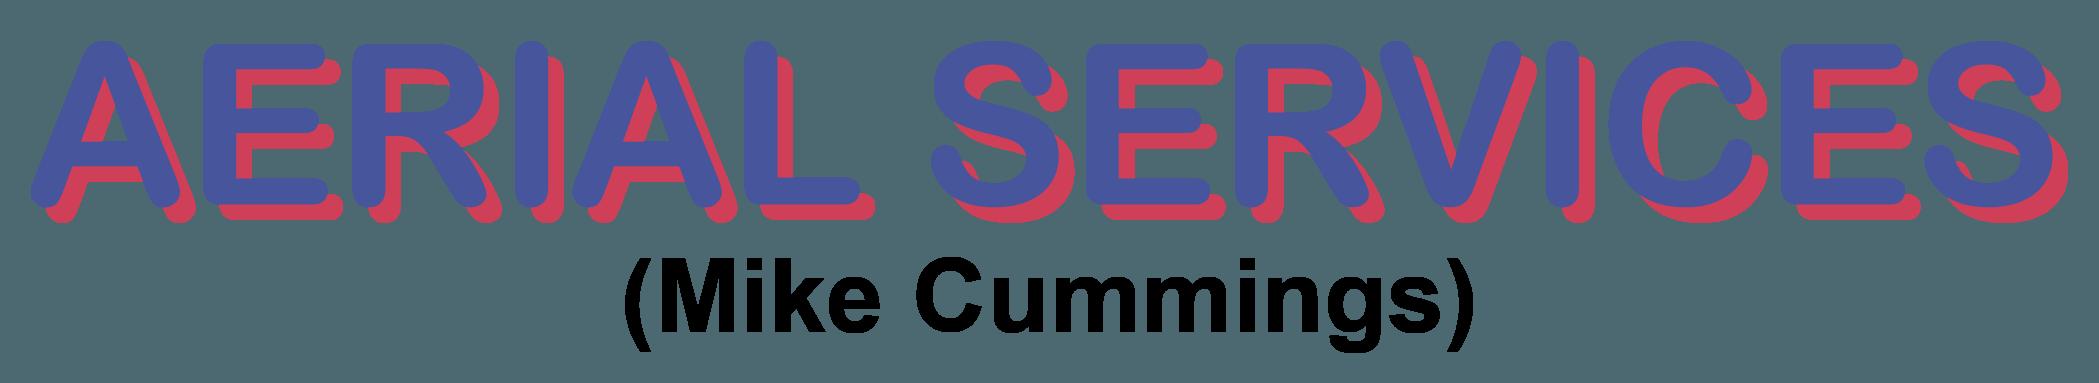 Aerial Services Mike Cummings Logo